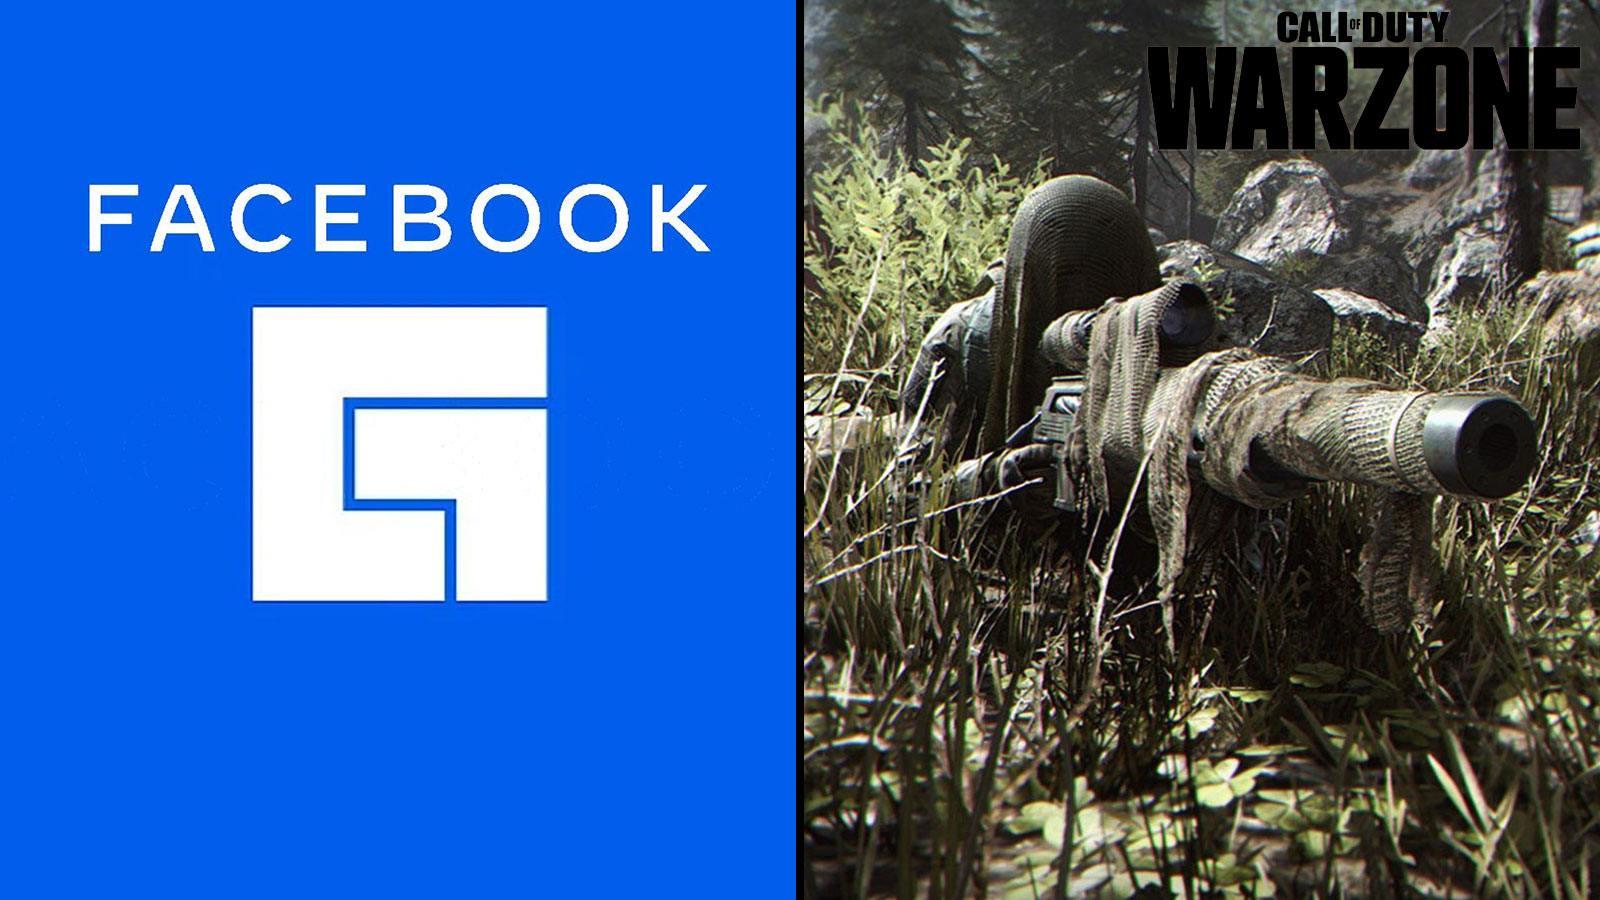 Facebook Gaming Warzone Activision